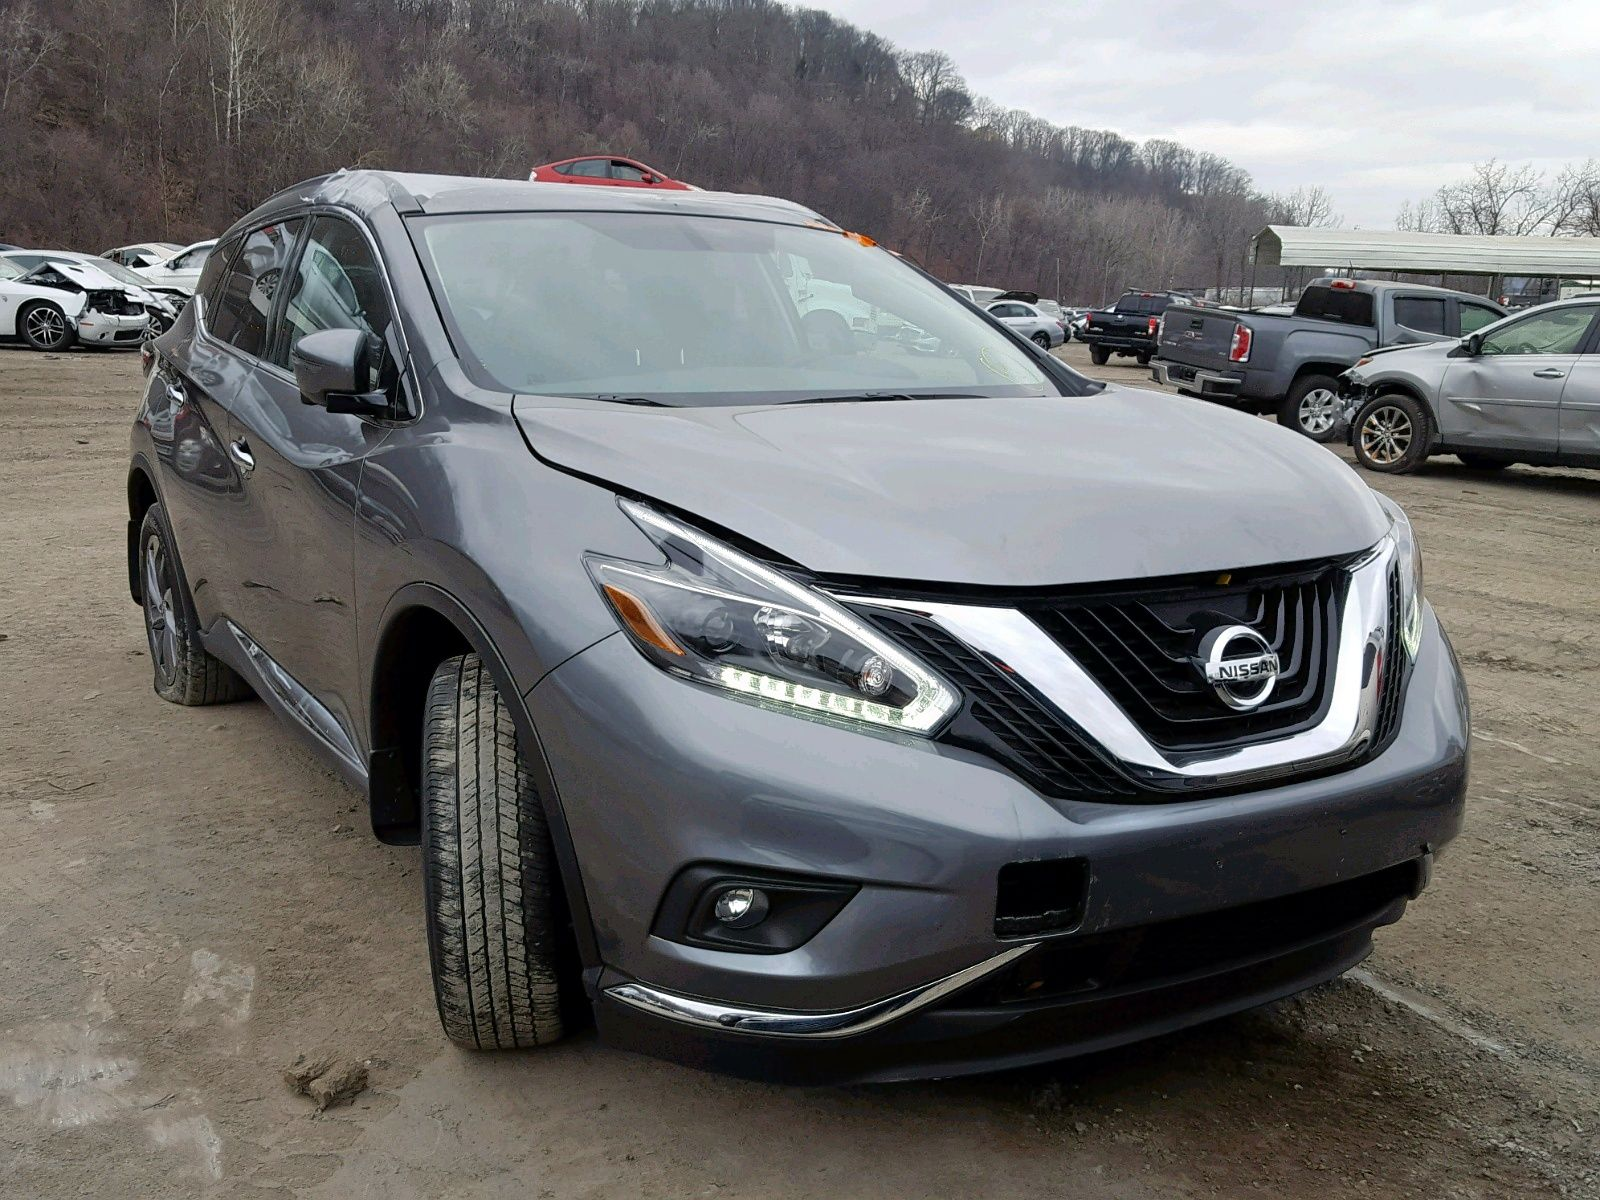 Salvage 2018 Nissan Murano S Nissan murano, Nissan, Car